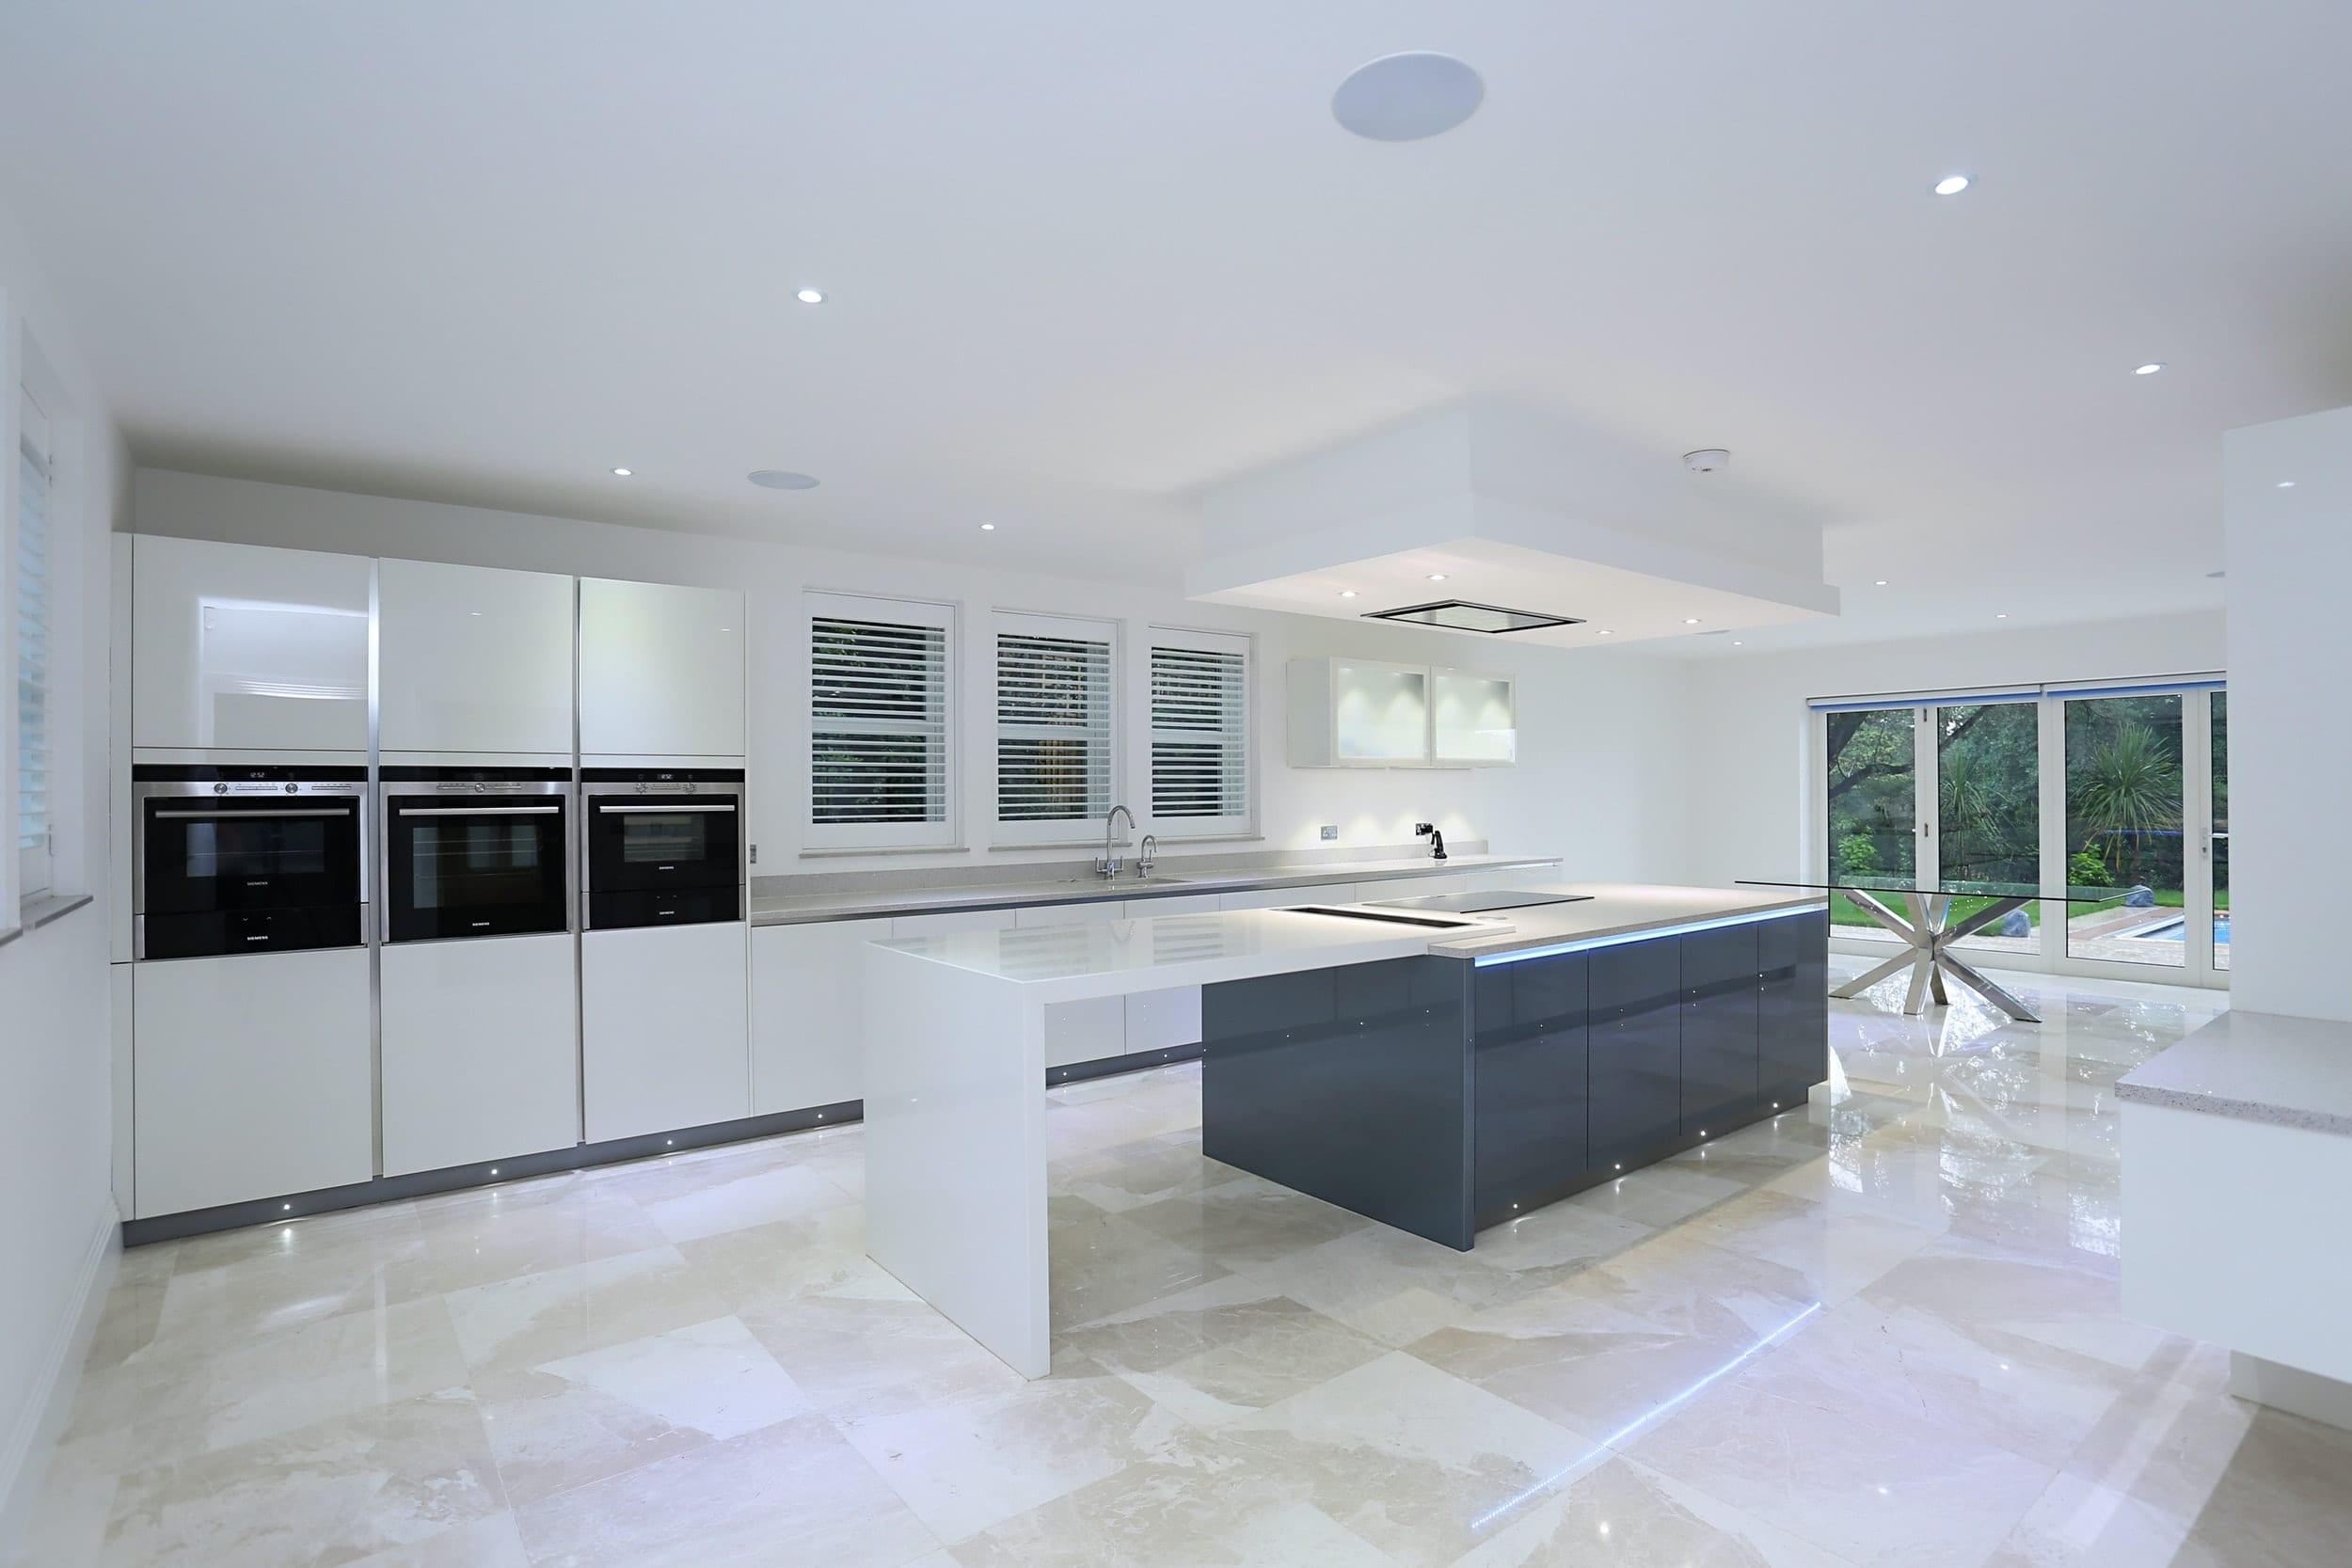 1. Handleless glass kitchen design 1 | Qudaus Living, Sutton Coldfield